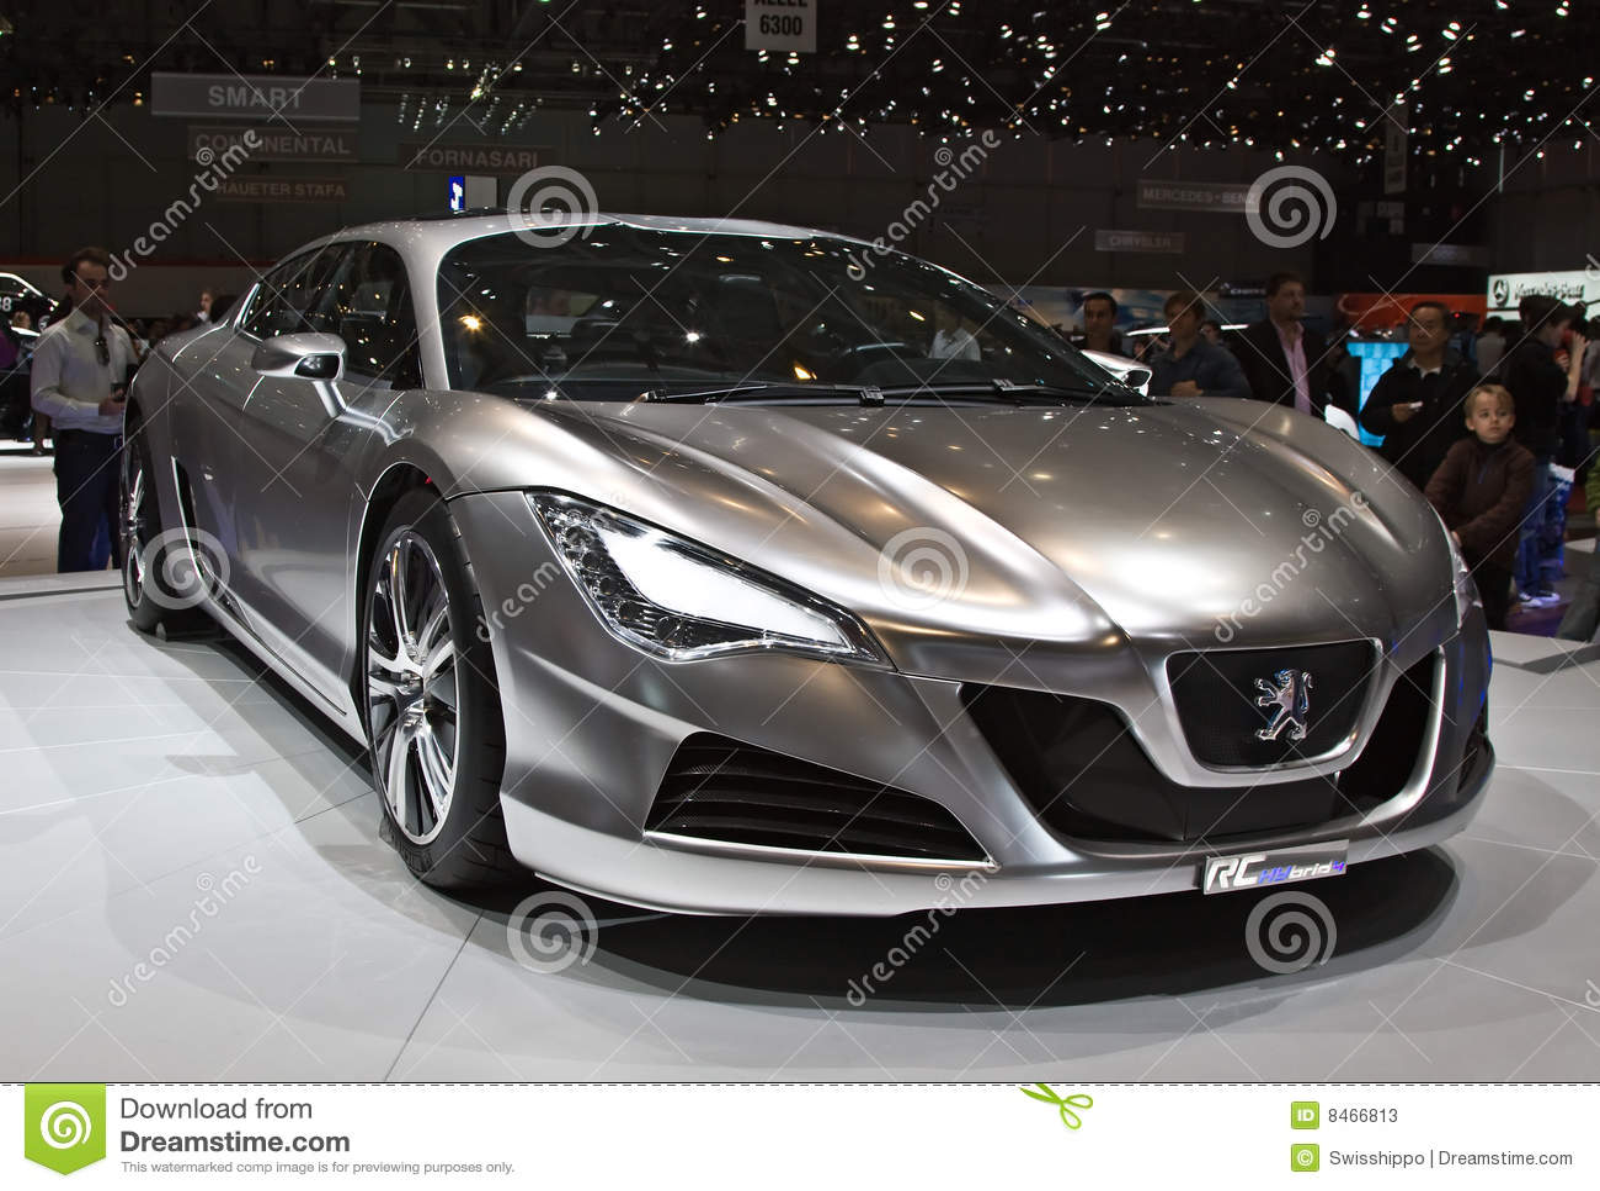 peugeot hybrid hr4 concept car editorial stock photo image 8466813. Black Bedroom Furniture Sets. Home Design Ideas